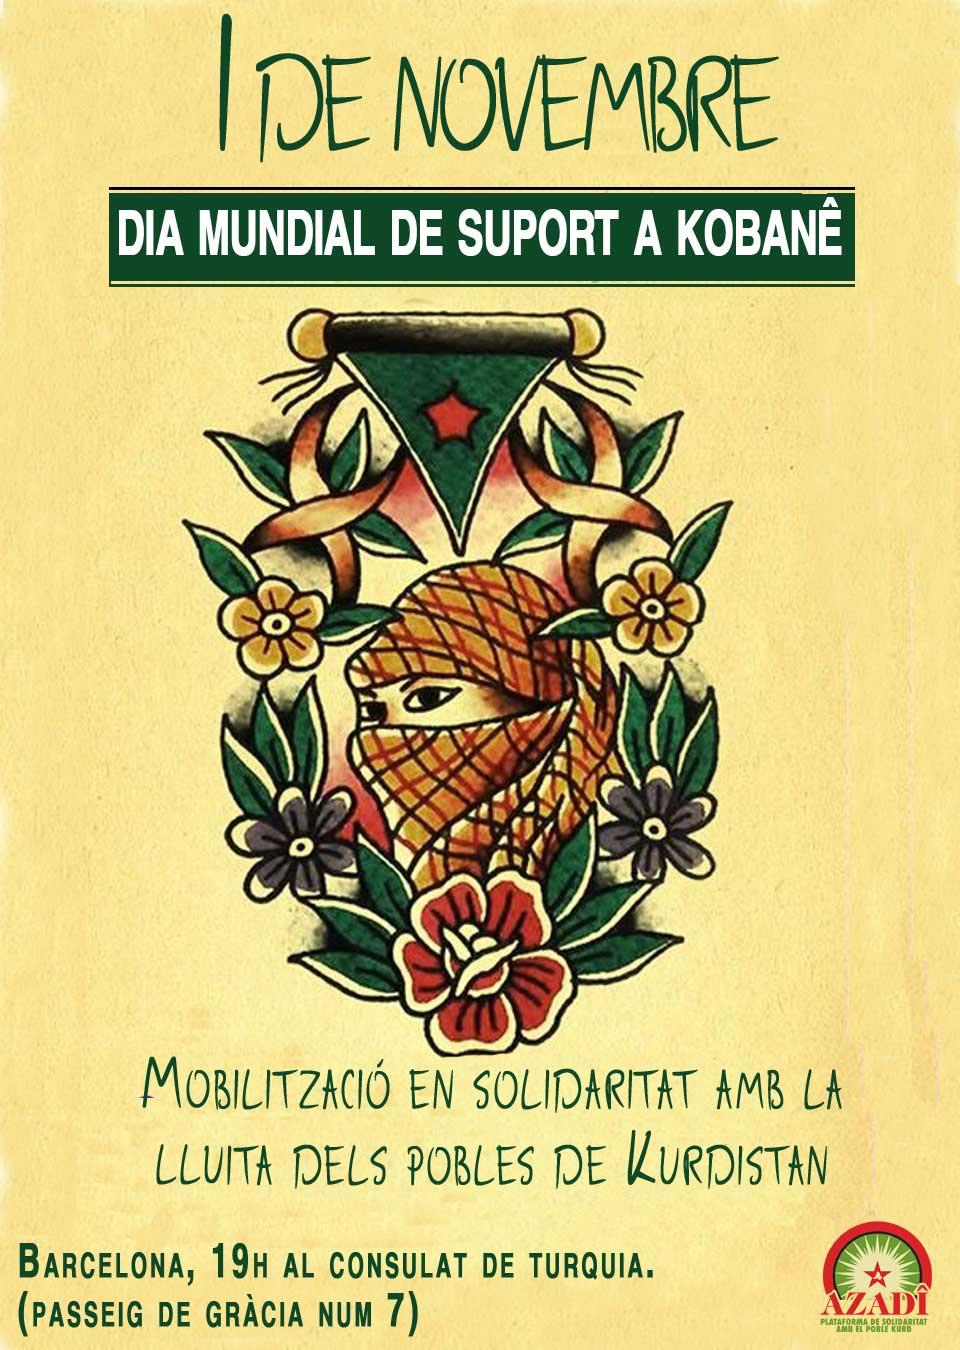 1 de Novembre: Dia mundial de suport a Kobane